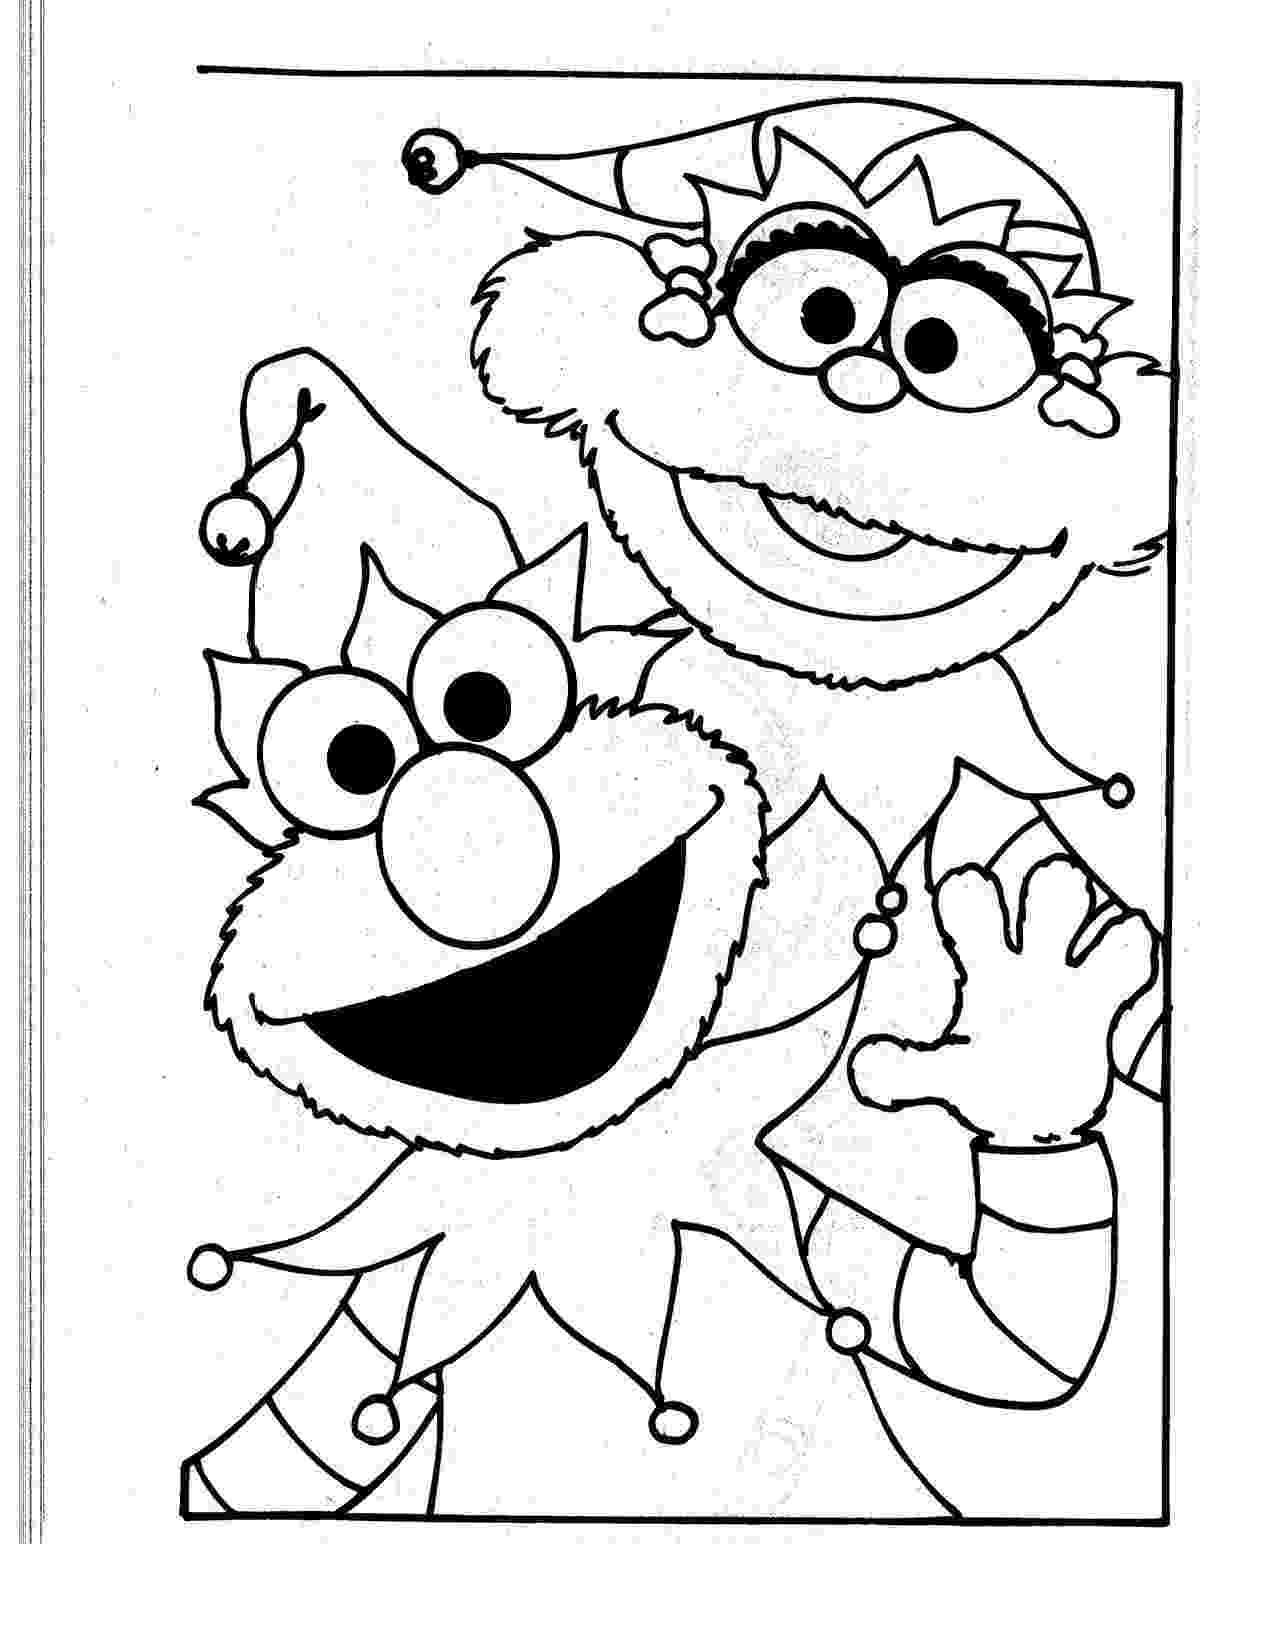 printable elmo coloring sheets free printable elmo coloring pages for kids coloring printable elmo sheets